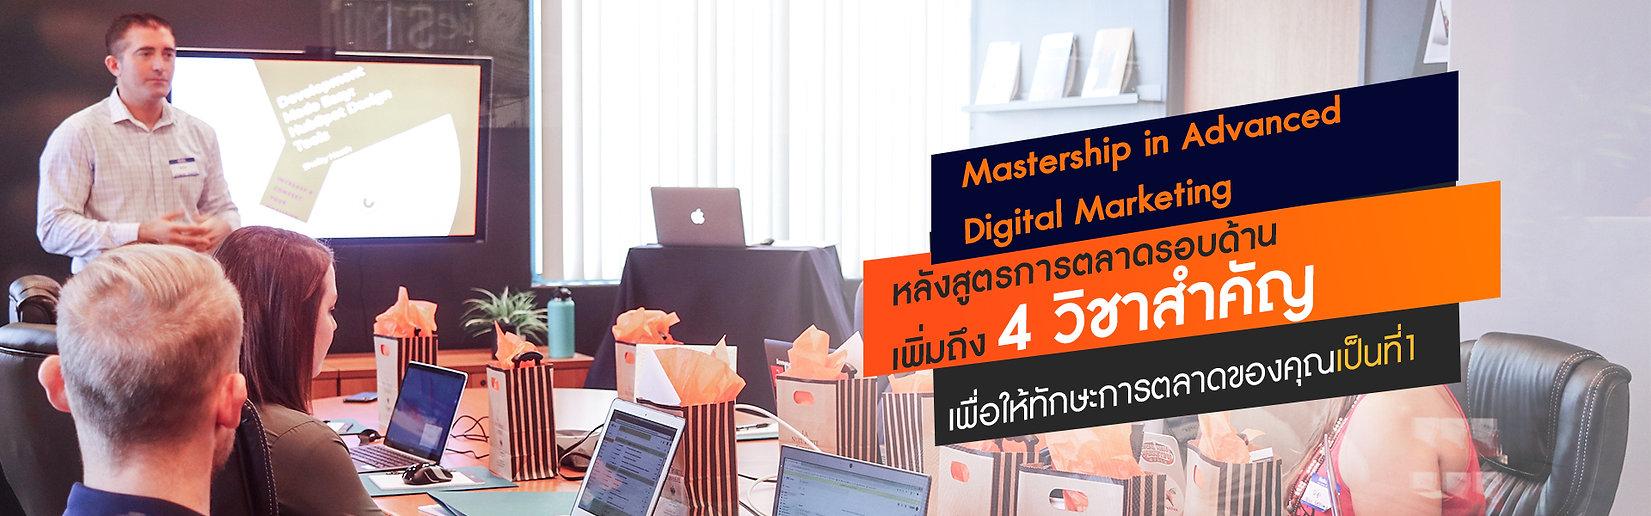 ad AIM2004009 IDM Banner web  Mastership